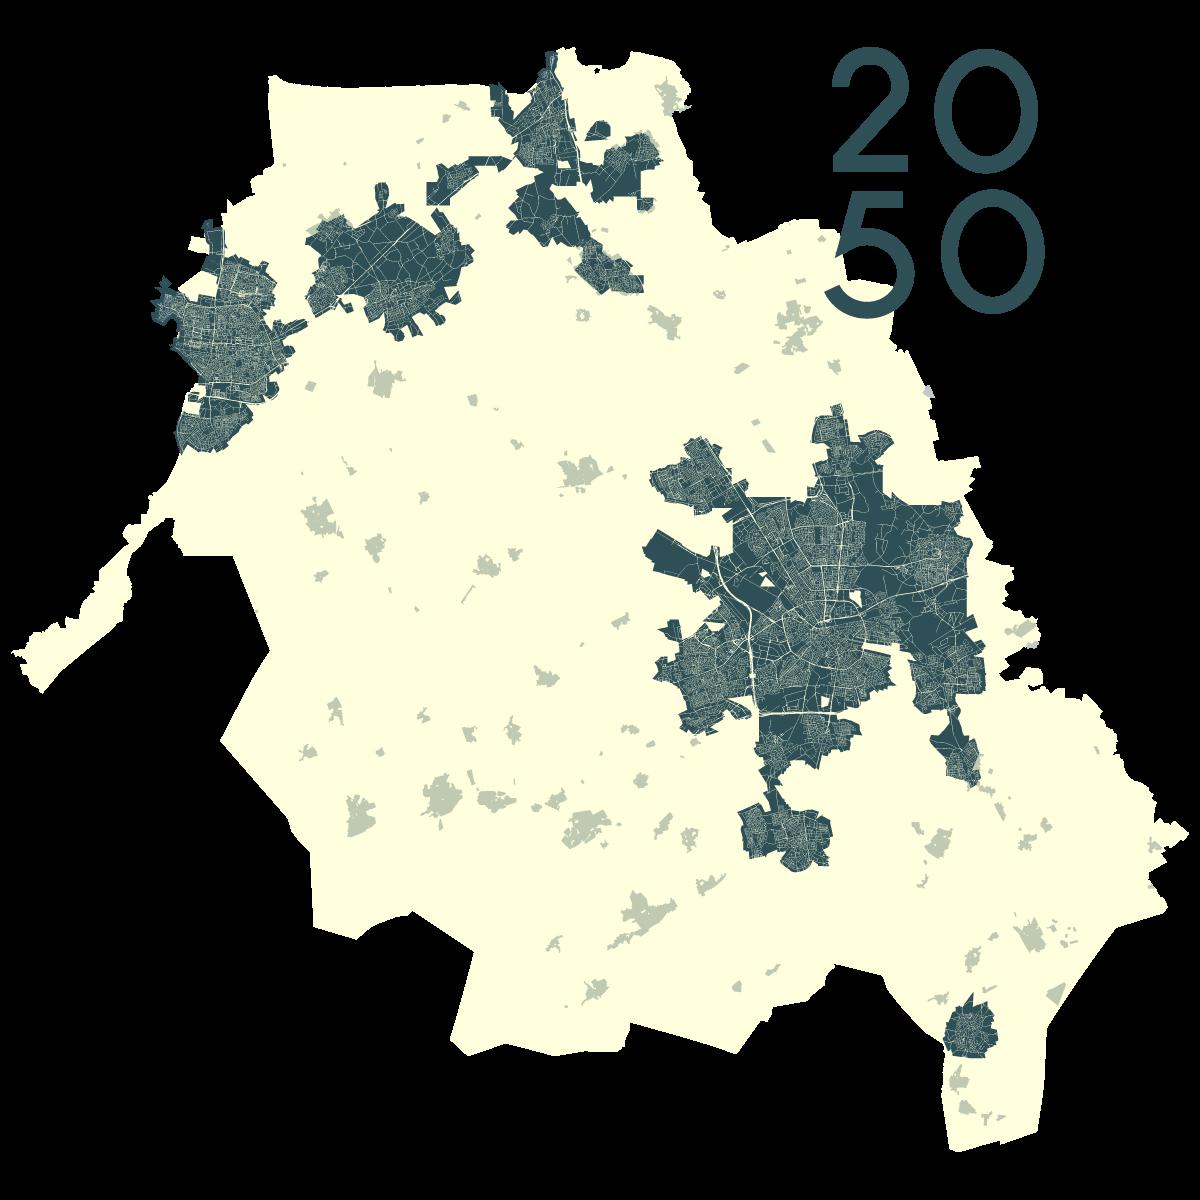 Zand-en-megasteden-2050